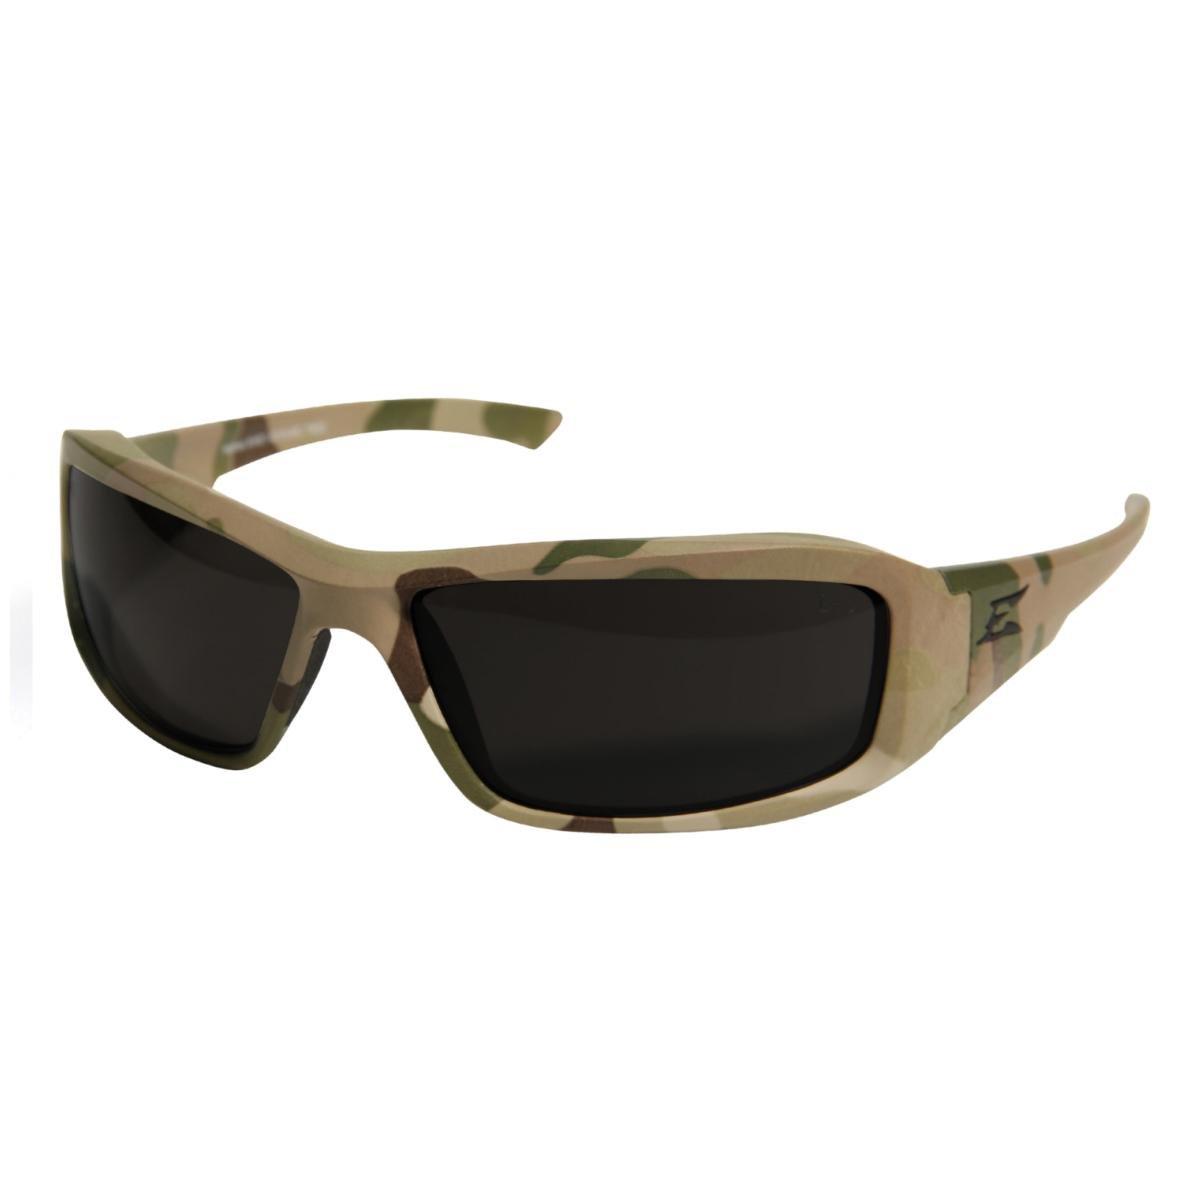 Edge Eyewear Hamel Glasses, Multicam Frame/G-15 Vapor Shield Lens by Eagle Claw